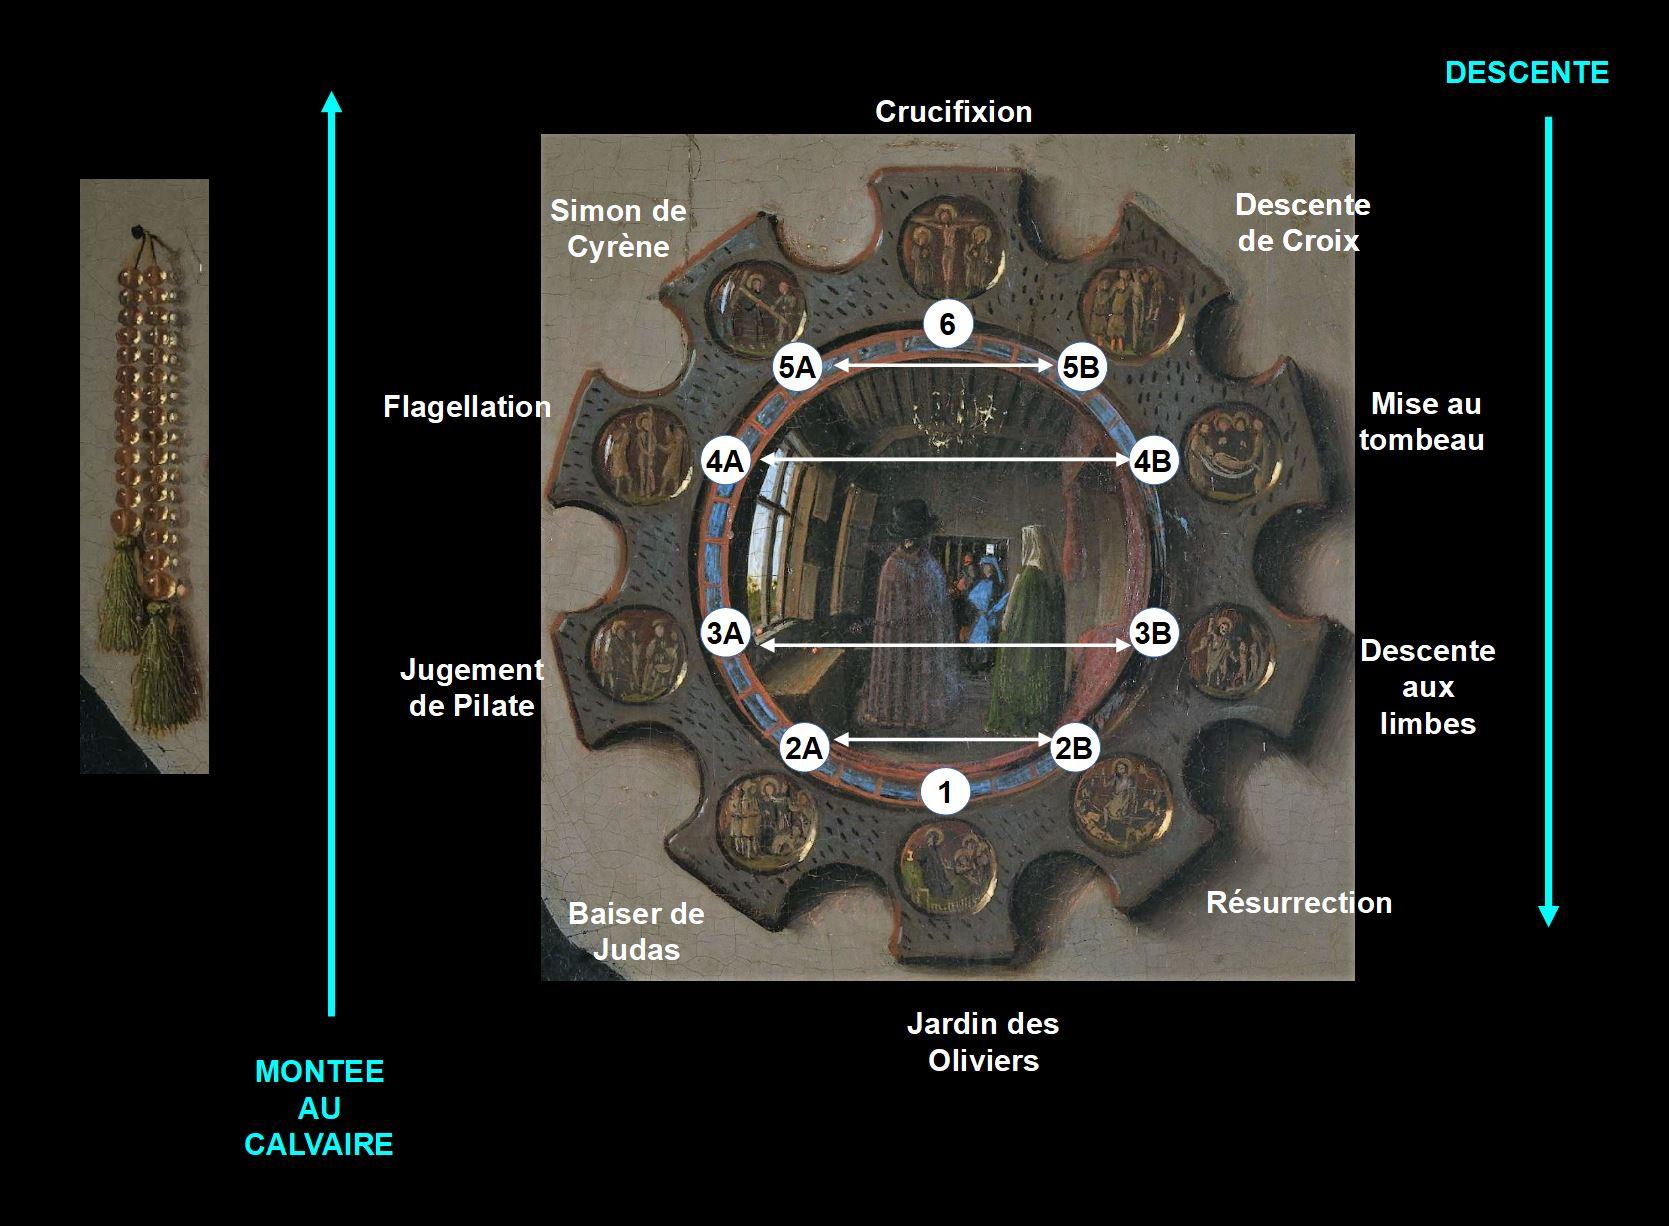 Van_Eyck 1434 _Arnolfini_Portrait miroir schema